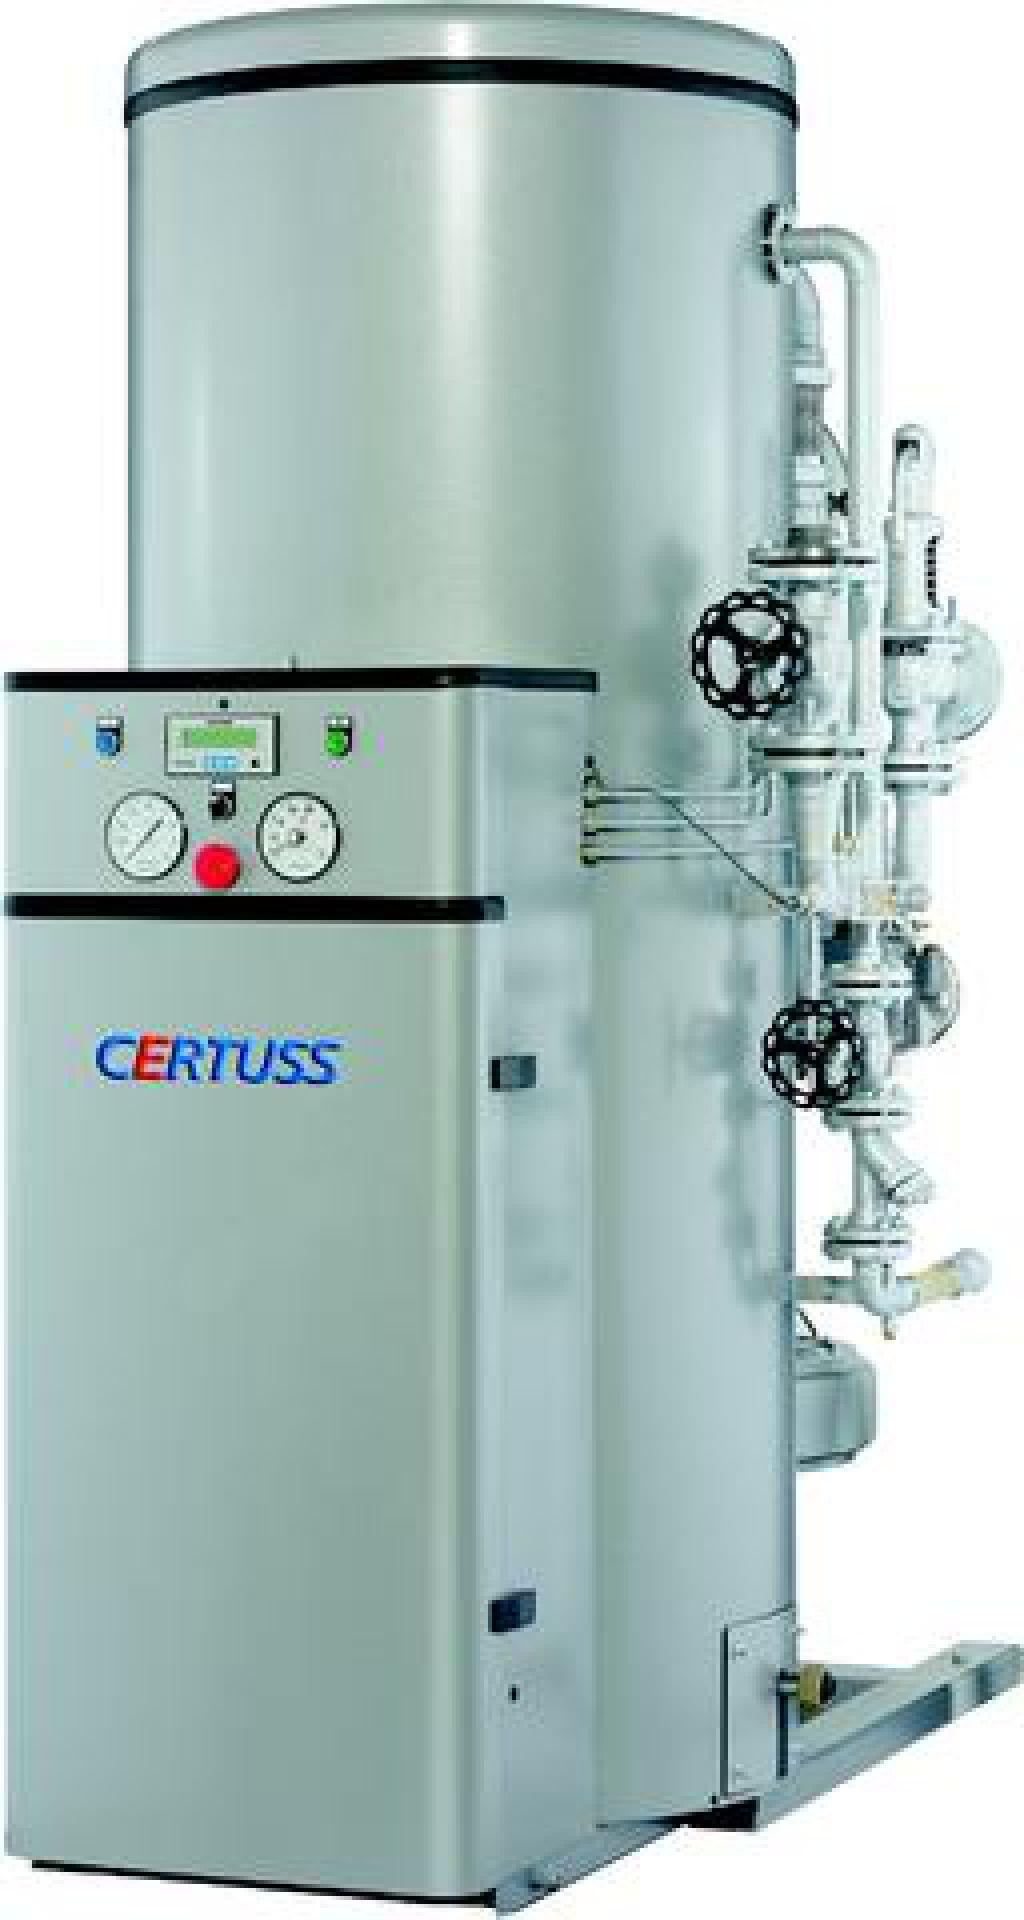 CERTUSS UNIVERSAL 1500 FG Steam generator for sale. Retrade offers ...